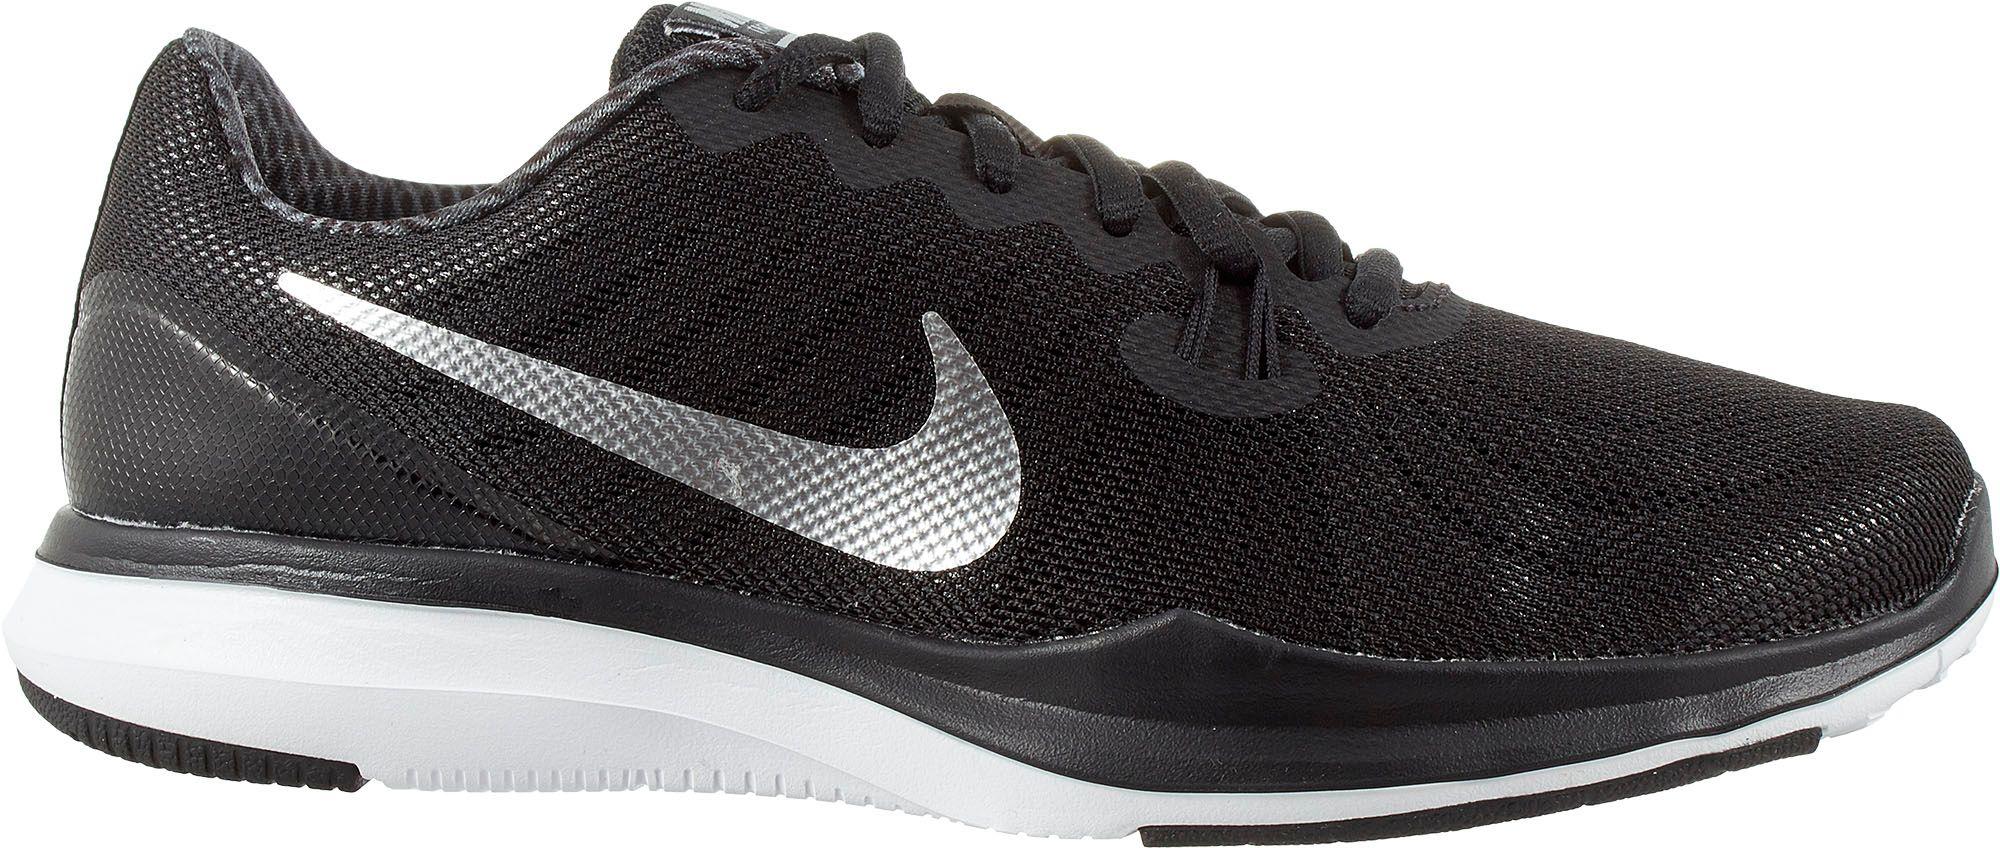 Nike In-Season TR 4 Print Trainers Womens Sports footwear Womens Trainers  COLOUR-black grey white 1e20f2cd0